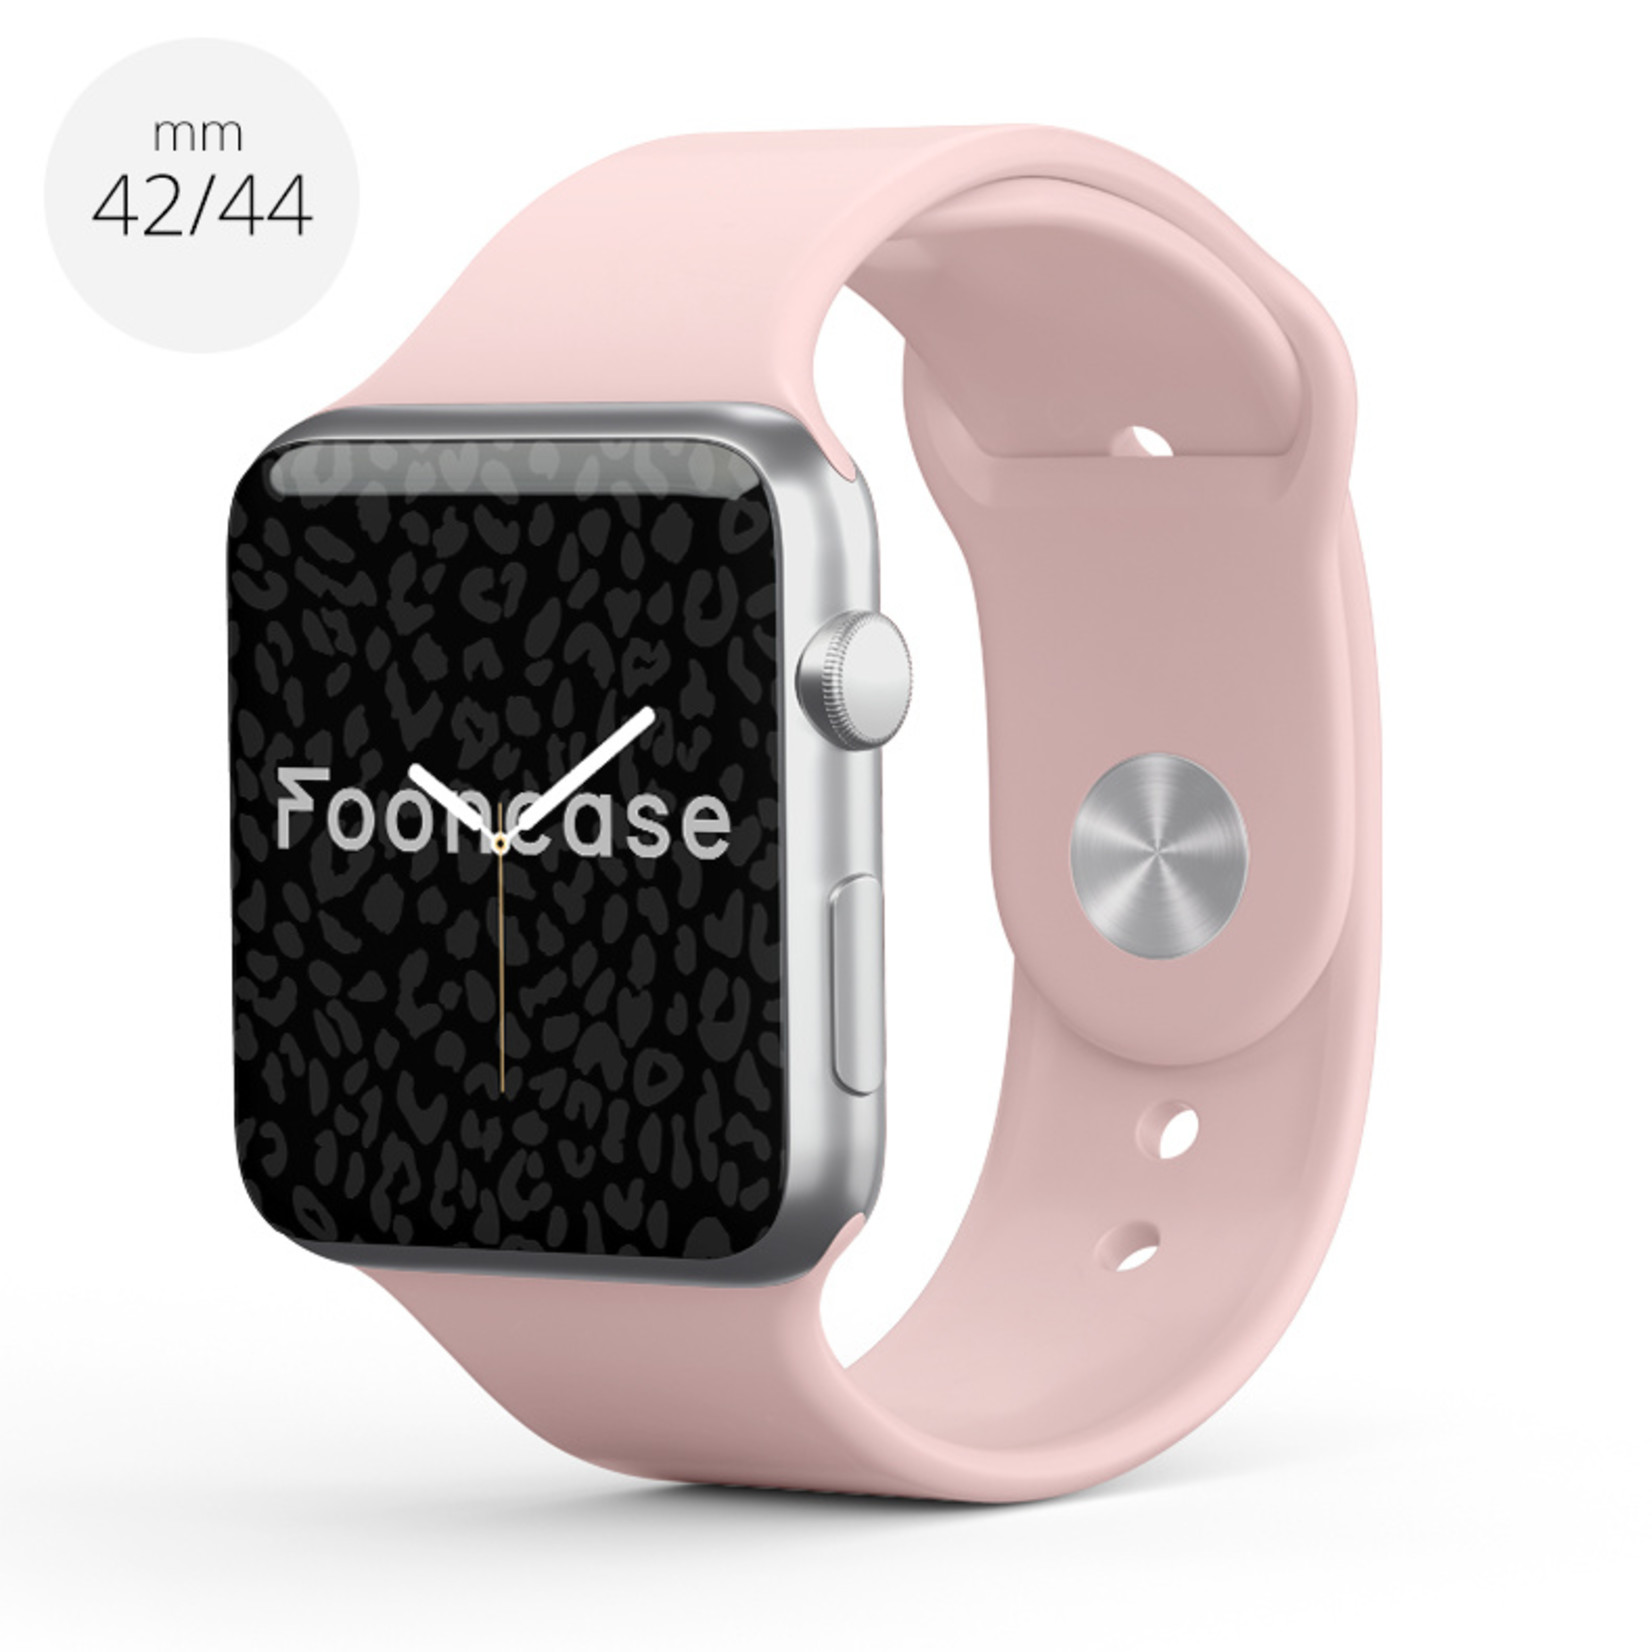 FOONCASE Apple Watch Series (1 t/m 6 / SE) - Oud Roze - 42/44mm